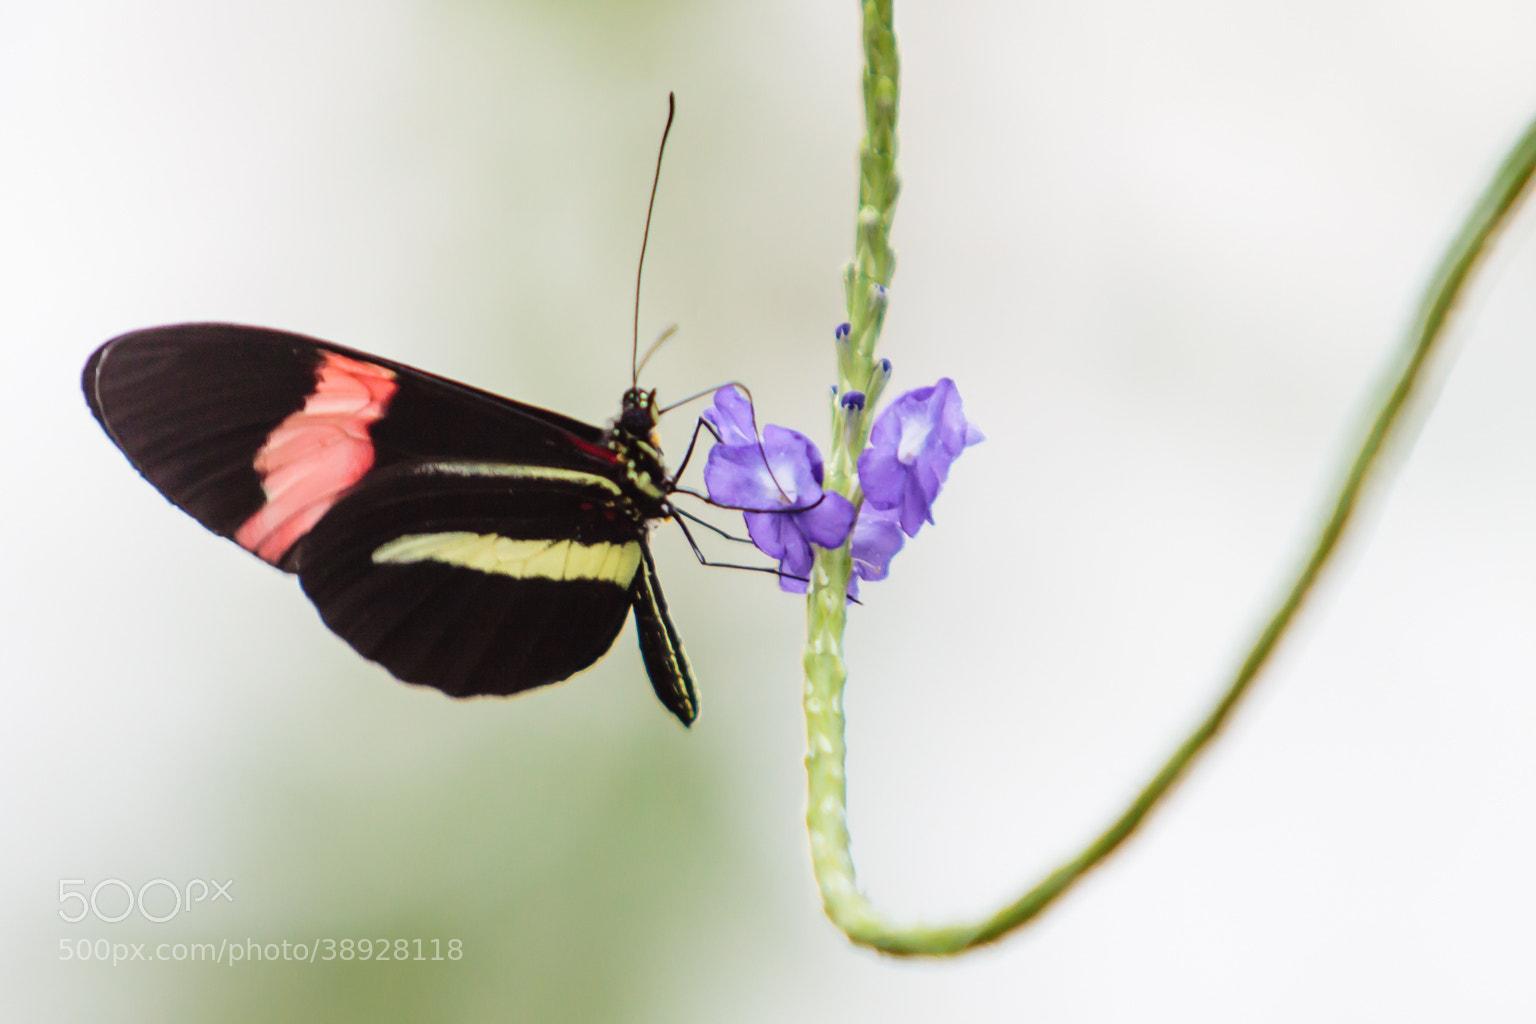 Photograph Butterfly by matthandi on 500px